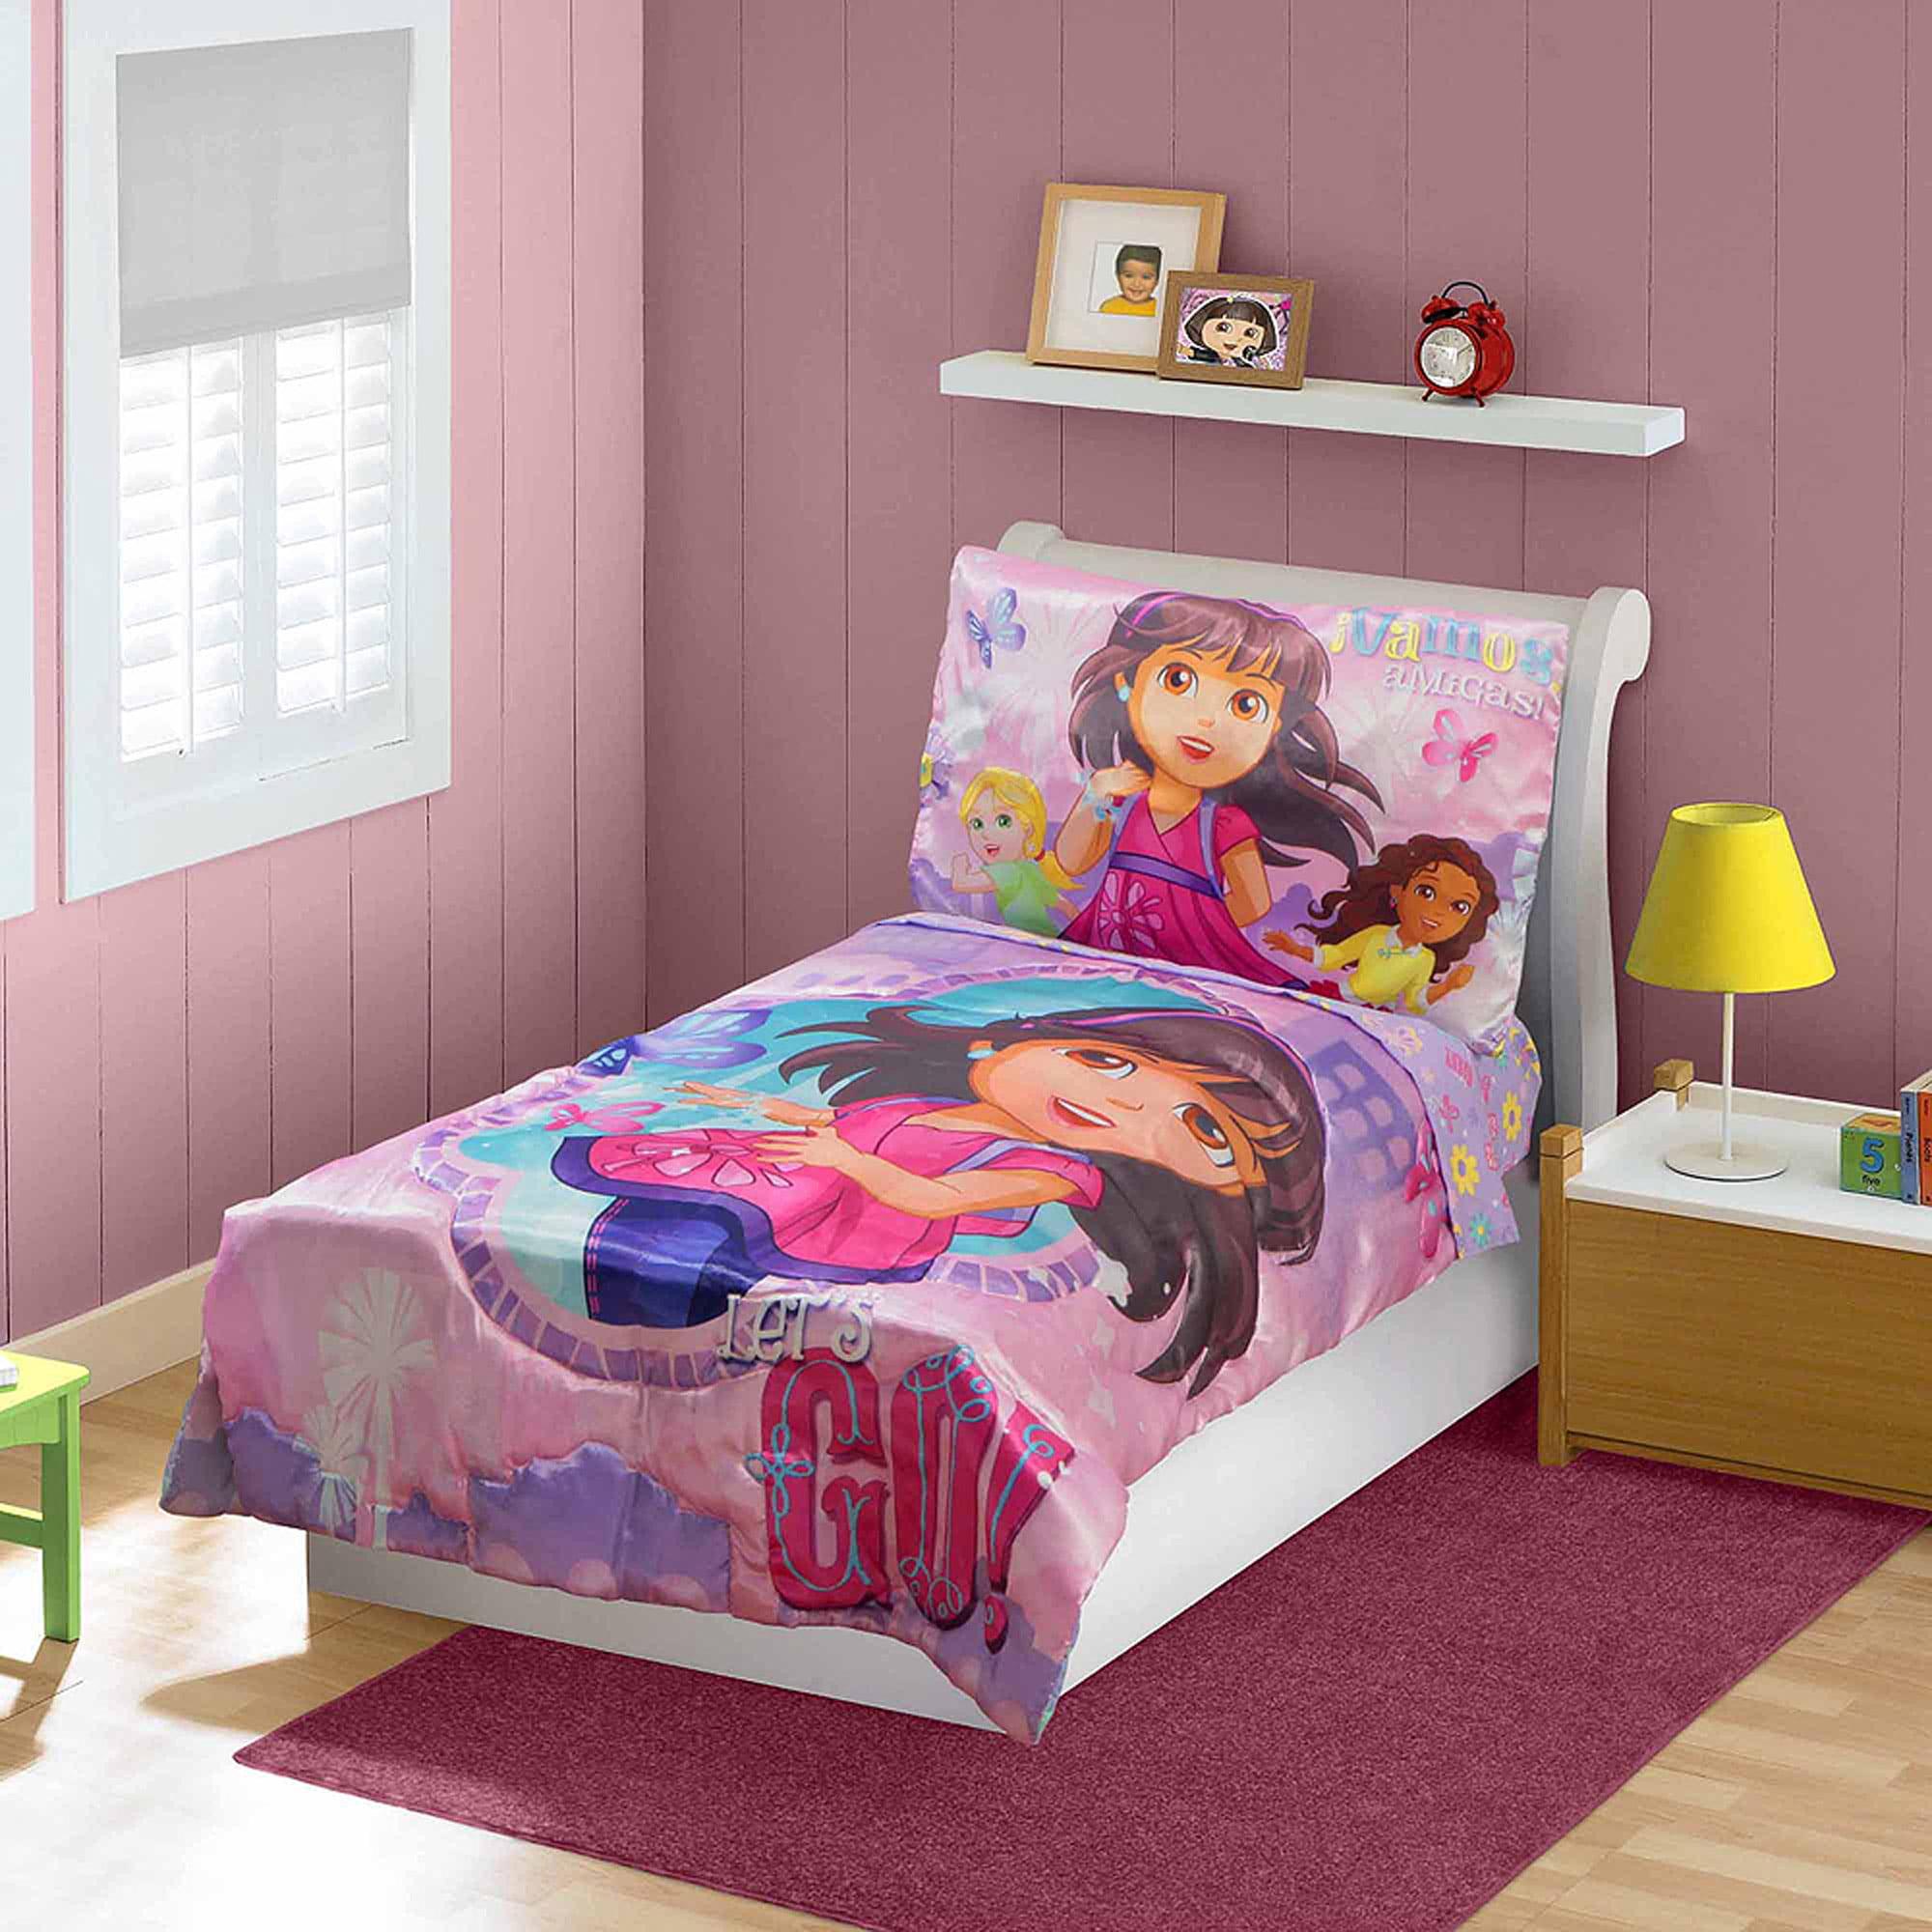 Dora & Friends 3 Piece Toddler Bedding Set with BONUS Matching Pillow Case